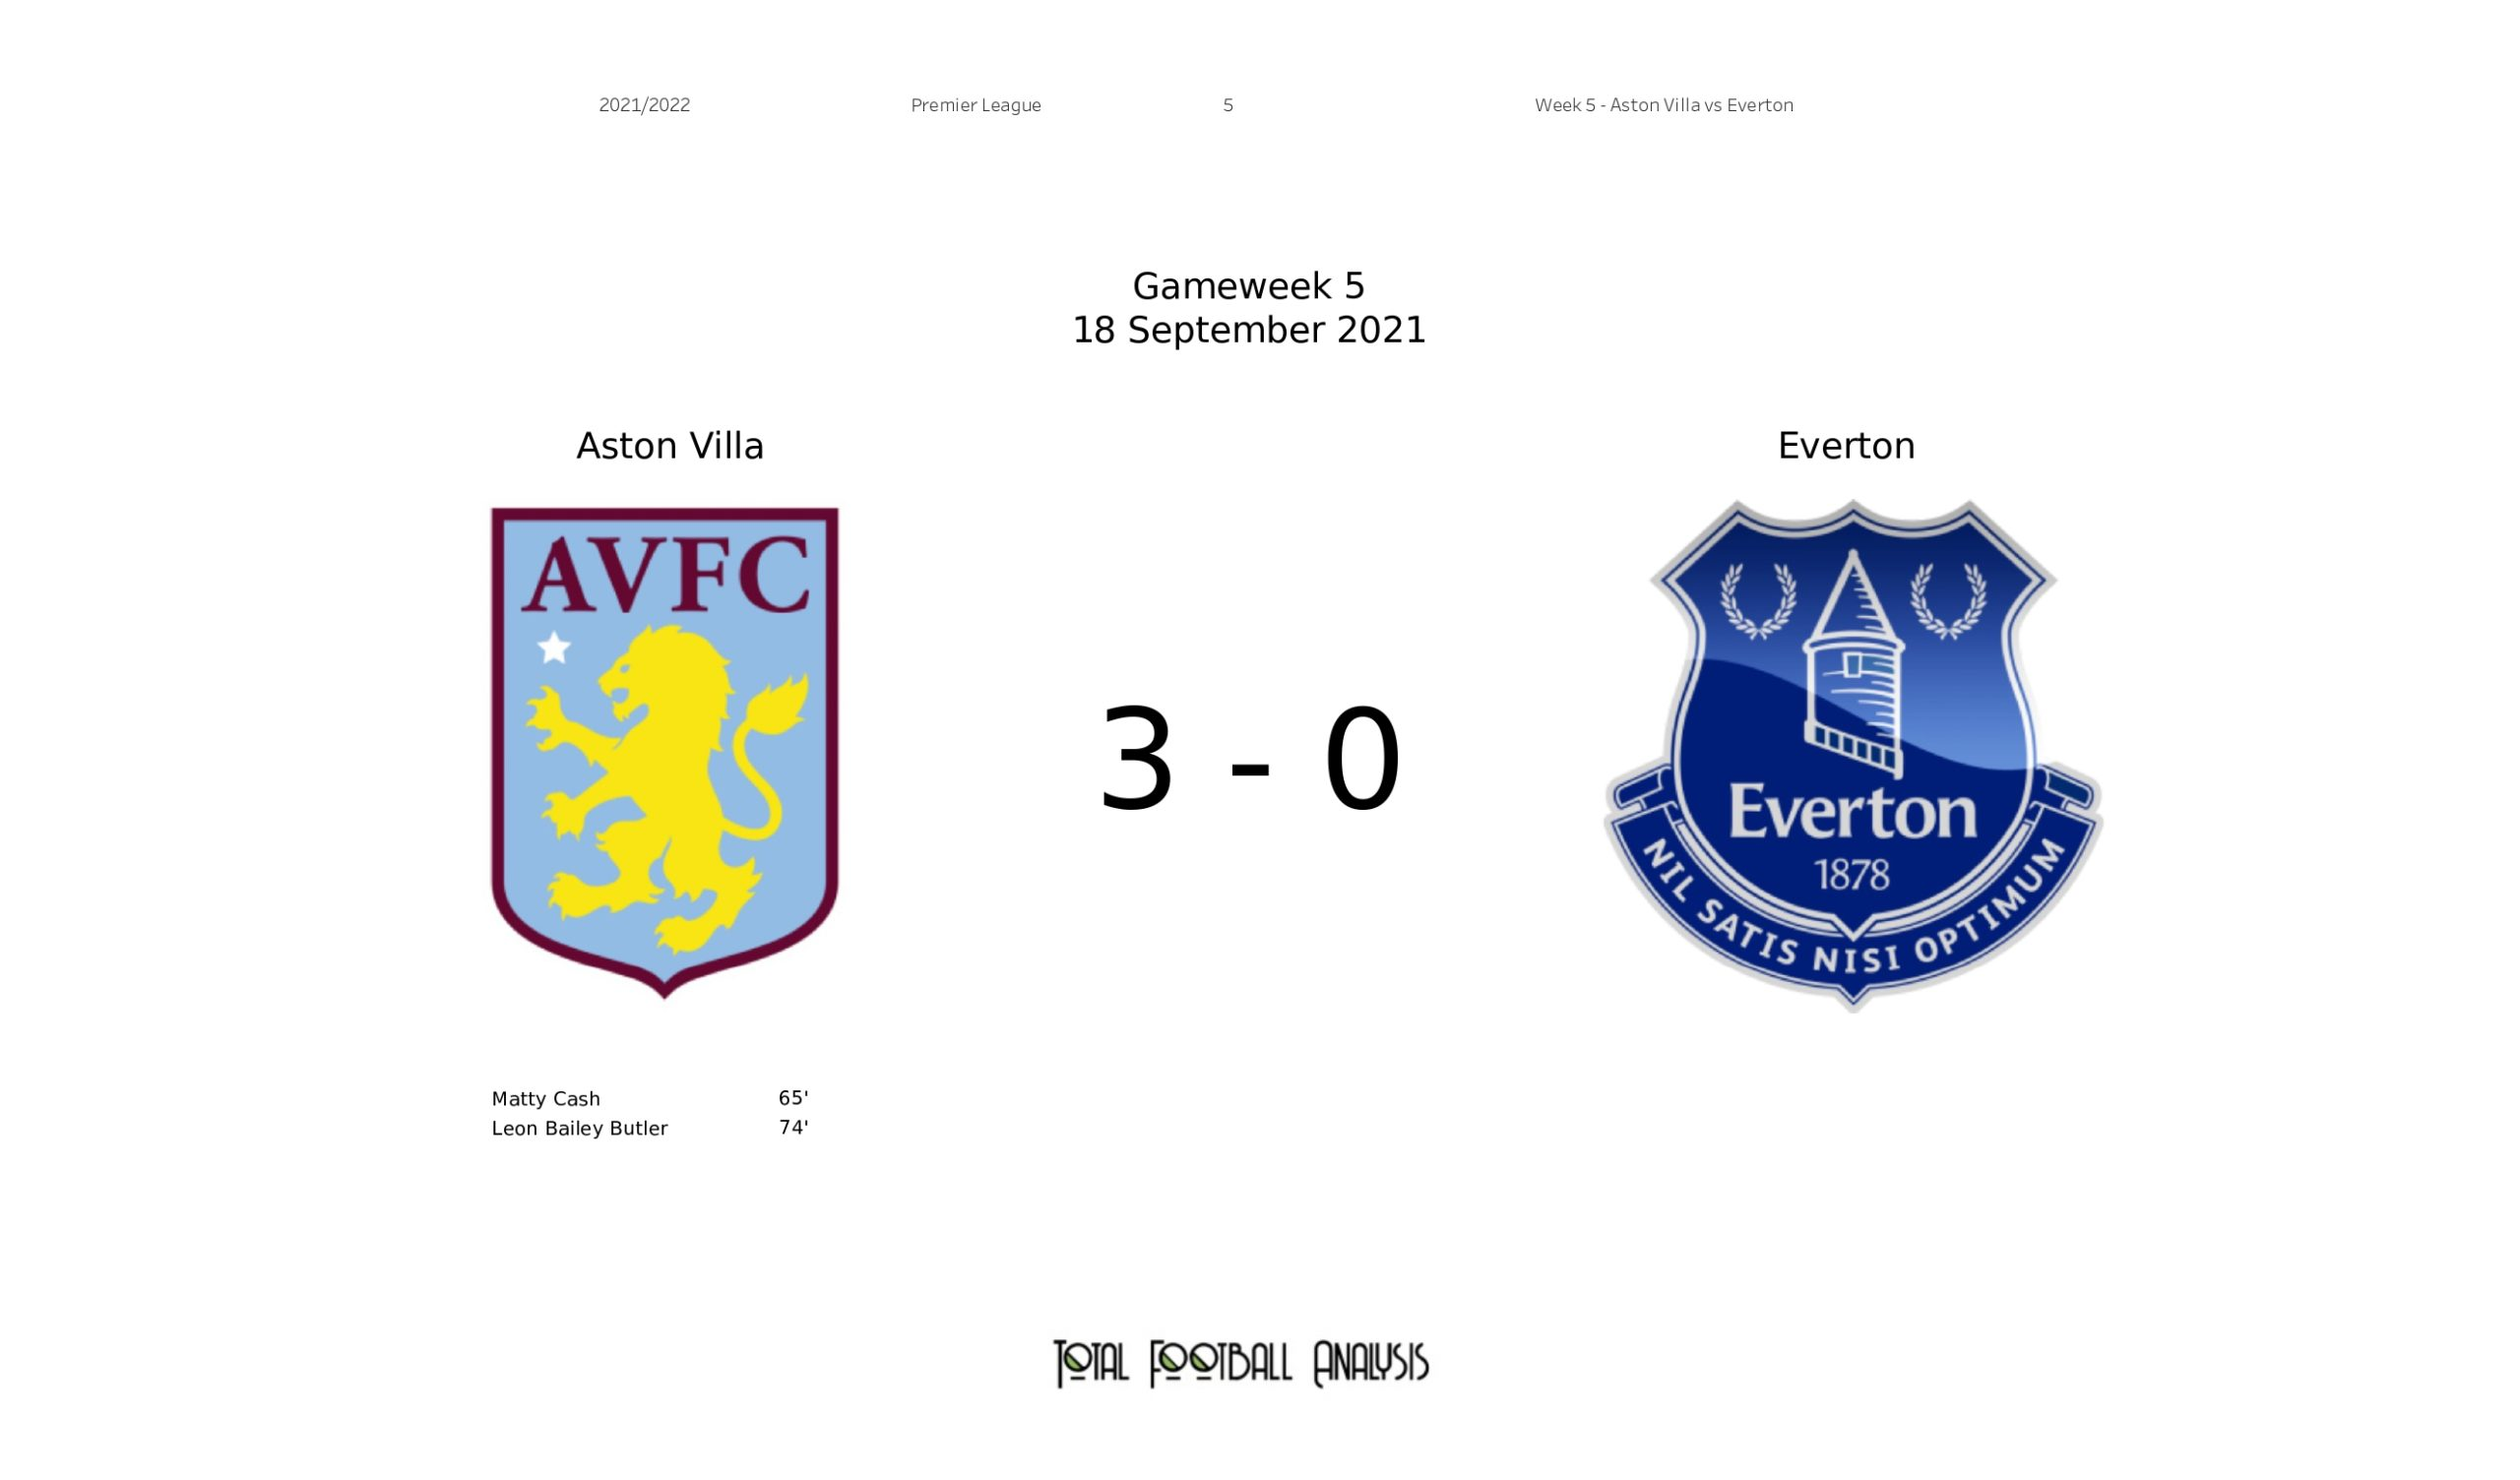 Premier League 2021/22: Aston Villa vs Everton stats